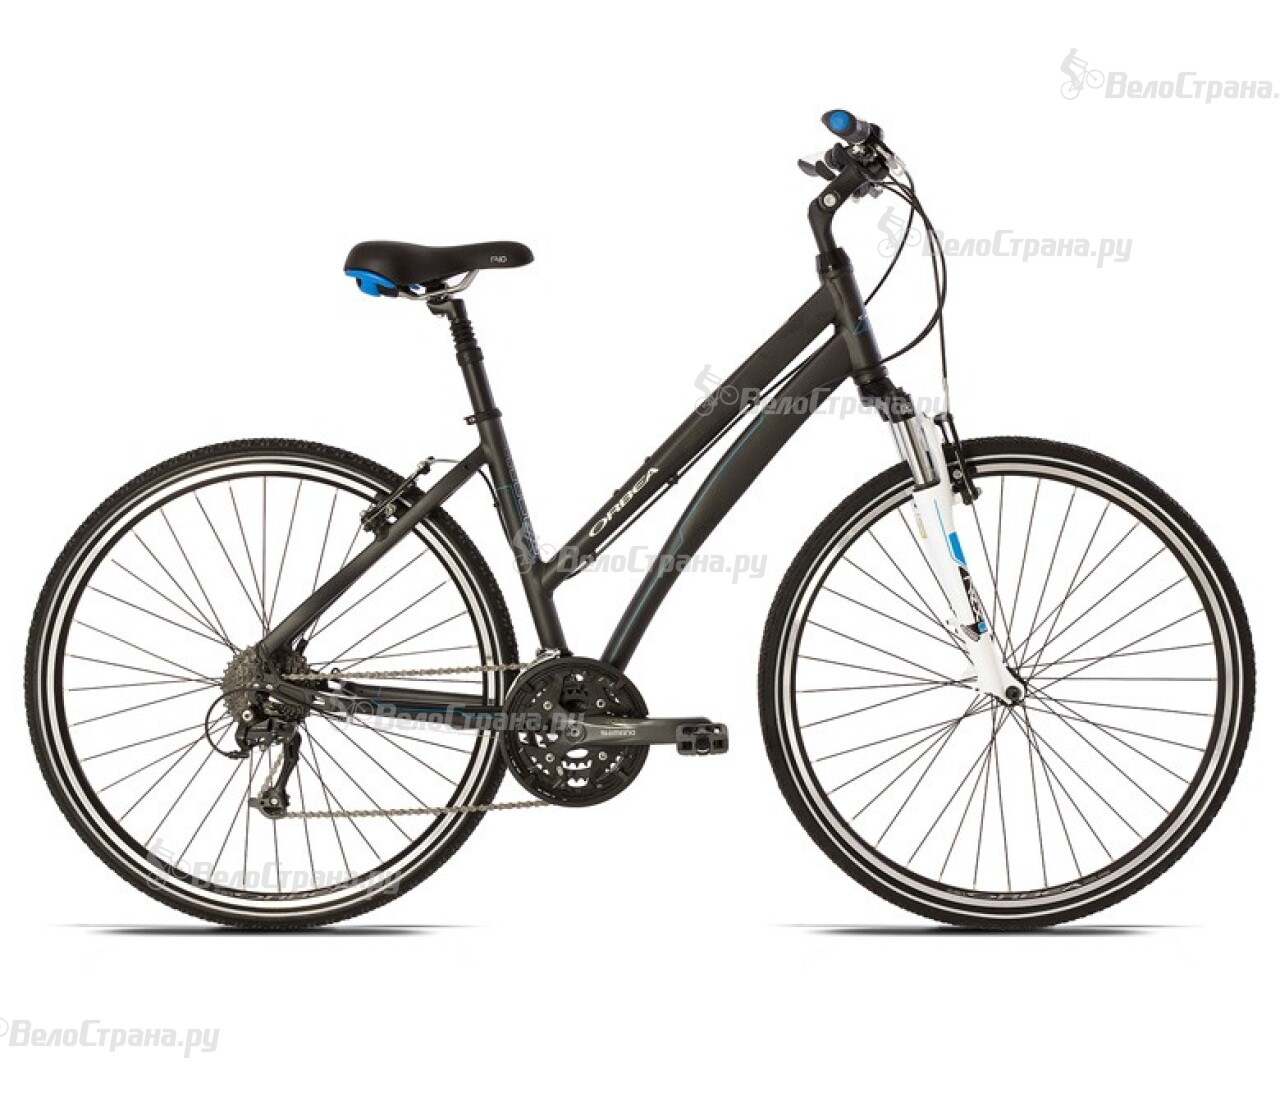 Велосипед Mongoose Tyax Sport (2013) велосипед mongoose switchback sport 2013